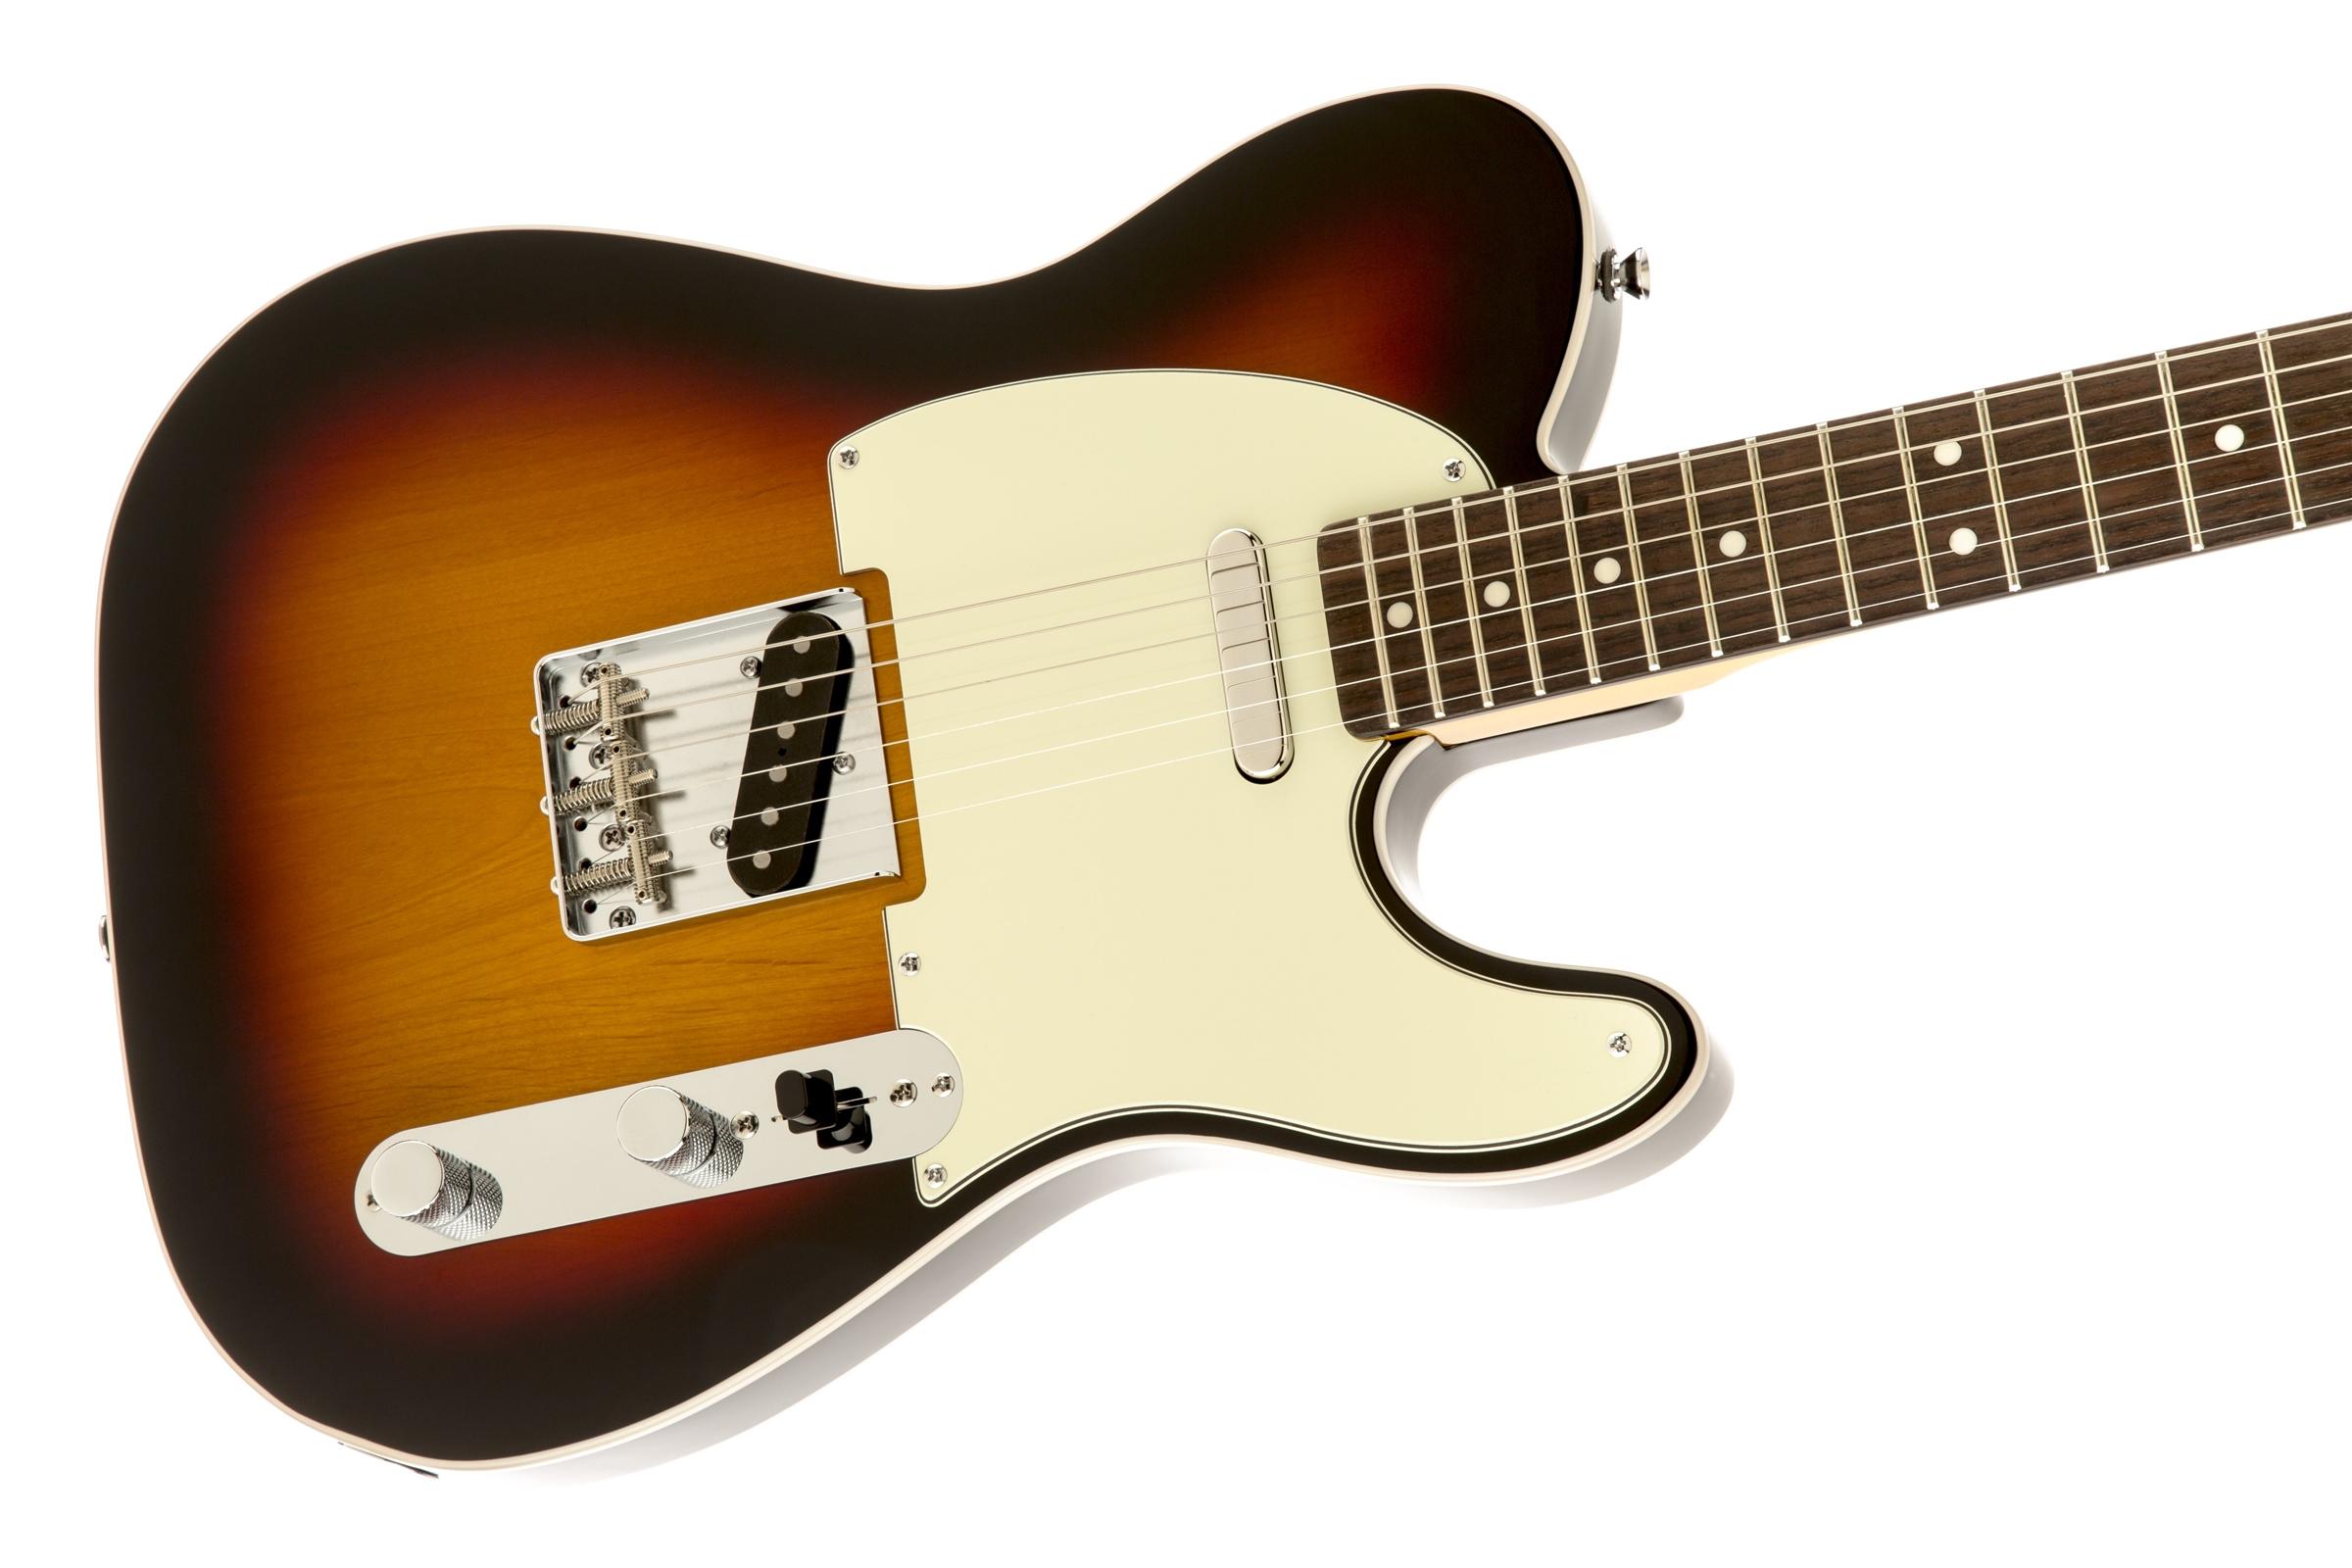 squier classic vibe telecaster custom squier electric guitars. Black Bedroom Furniture Sets. Home Design Ideas